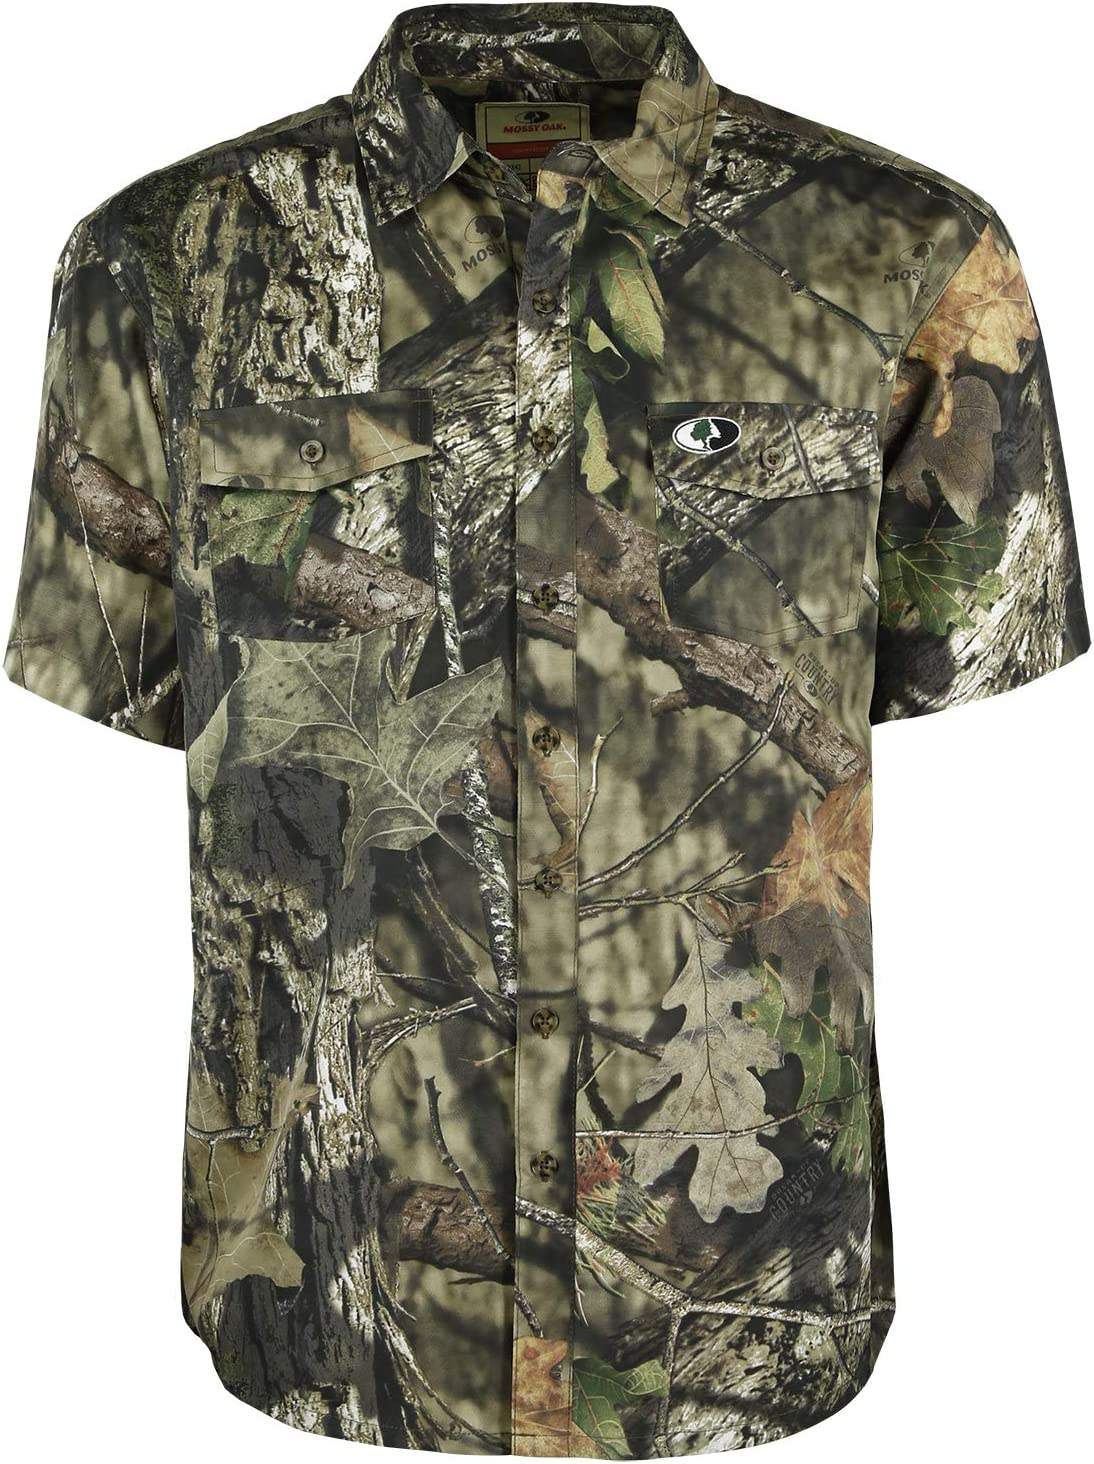 Mossy Oak Camo Ultralight Short Sleeve Hunting Shirt for Men